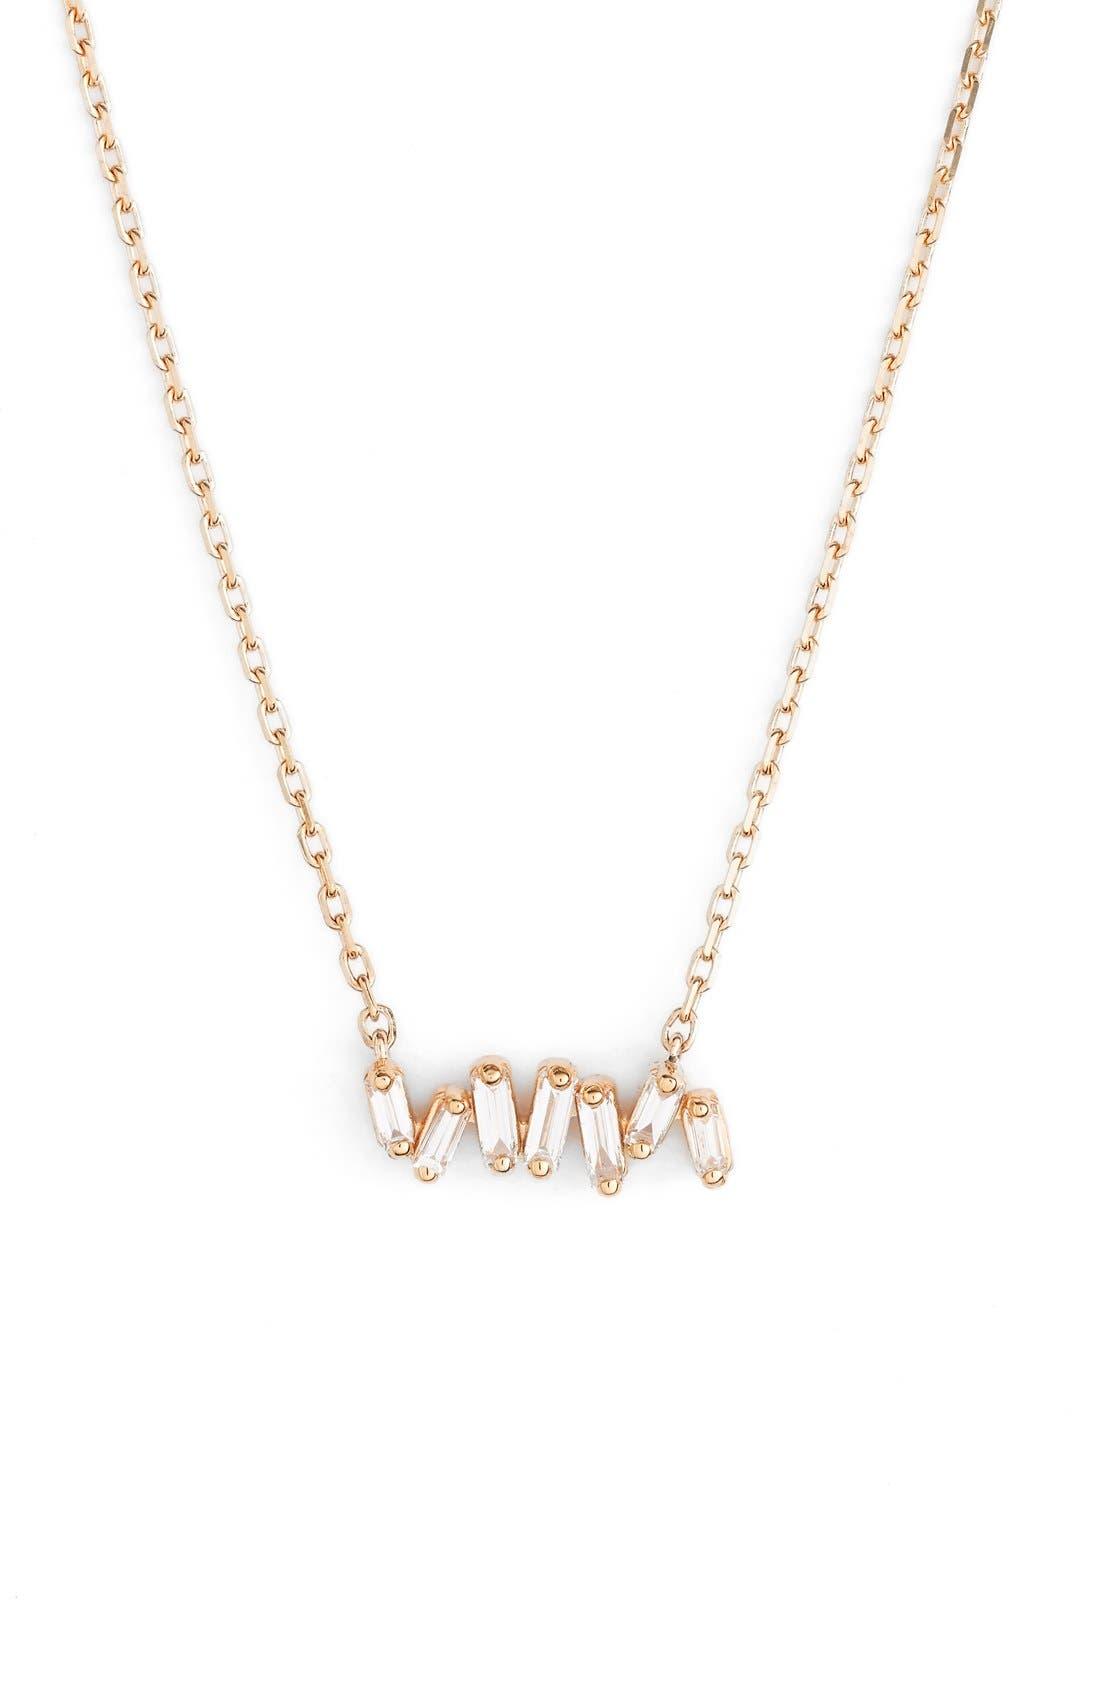 Alternate Image 1 Selected - Suzanne Kalan 'Fireworks' Diamond Baguette Mini Bar Pendant Necklace